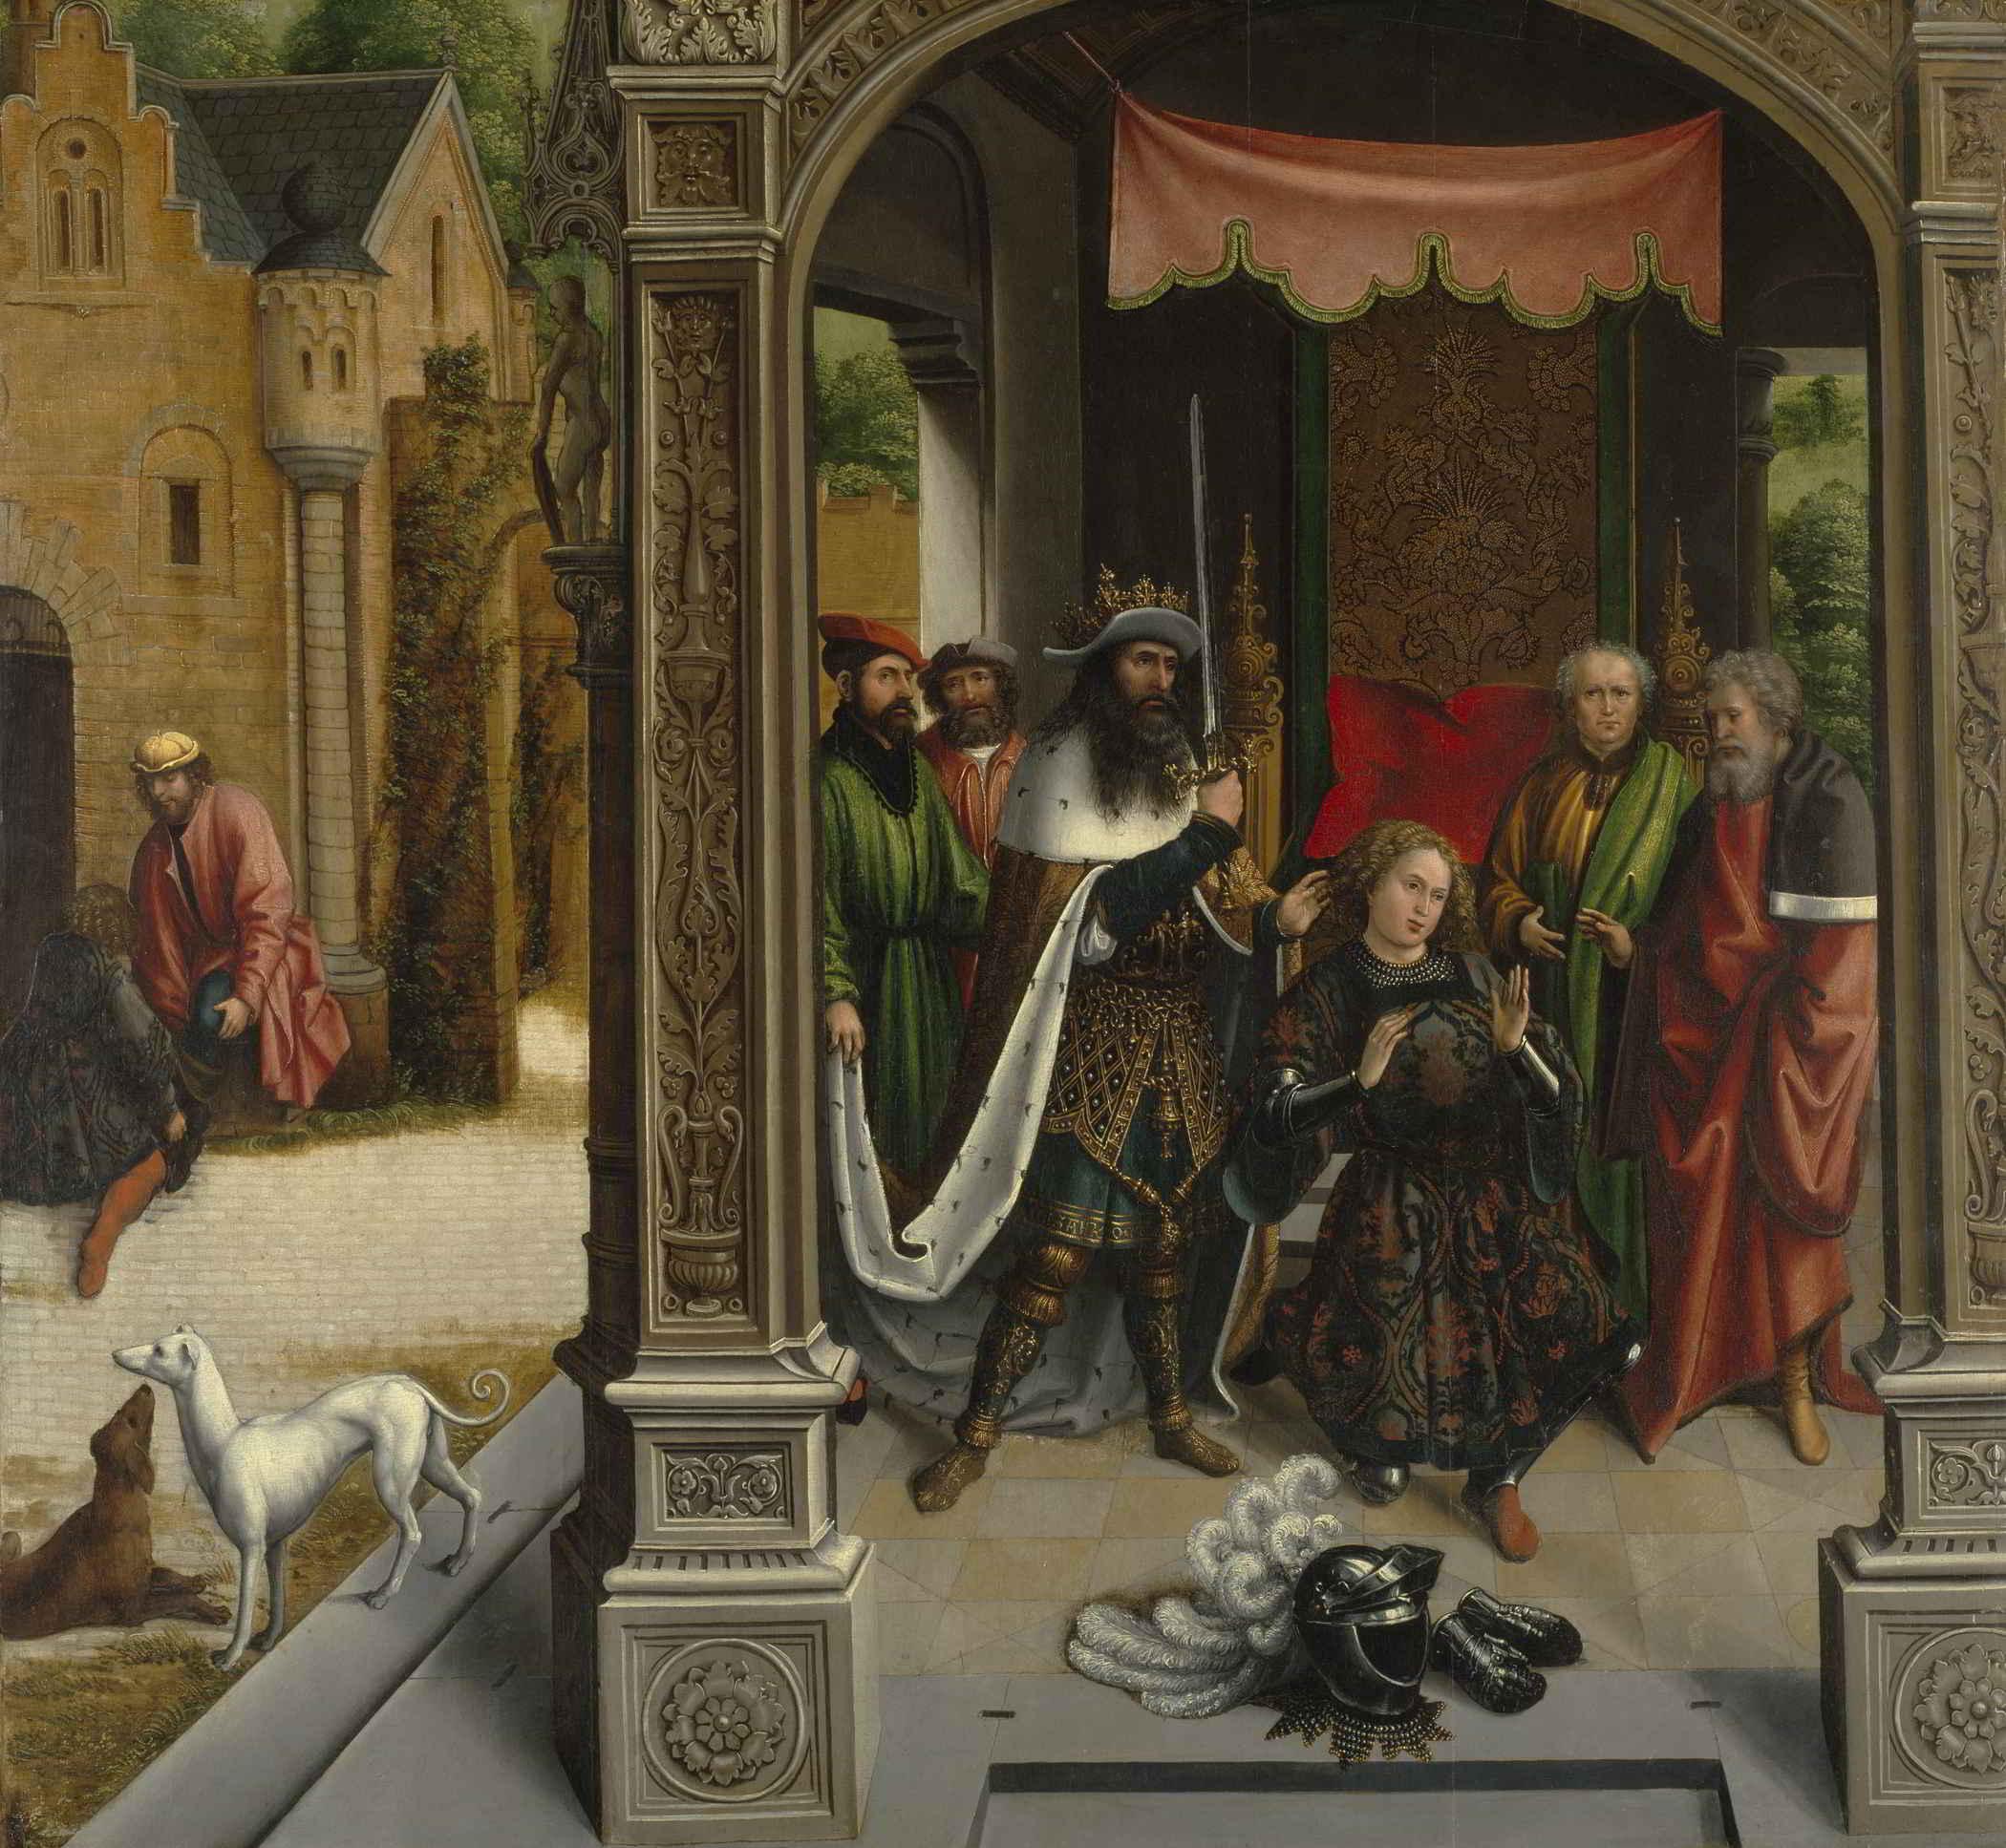 Bernard van Orley (1487-1541), The Knighting of Saint Martin by the Emperor Constantine, ca. 1514 Nelson-Atkins Museum of Art, Kansas City